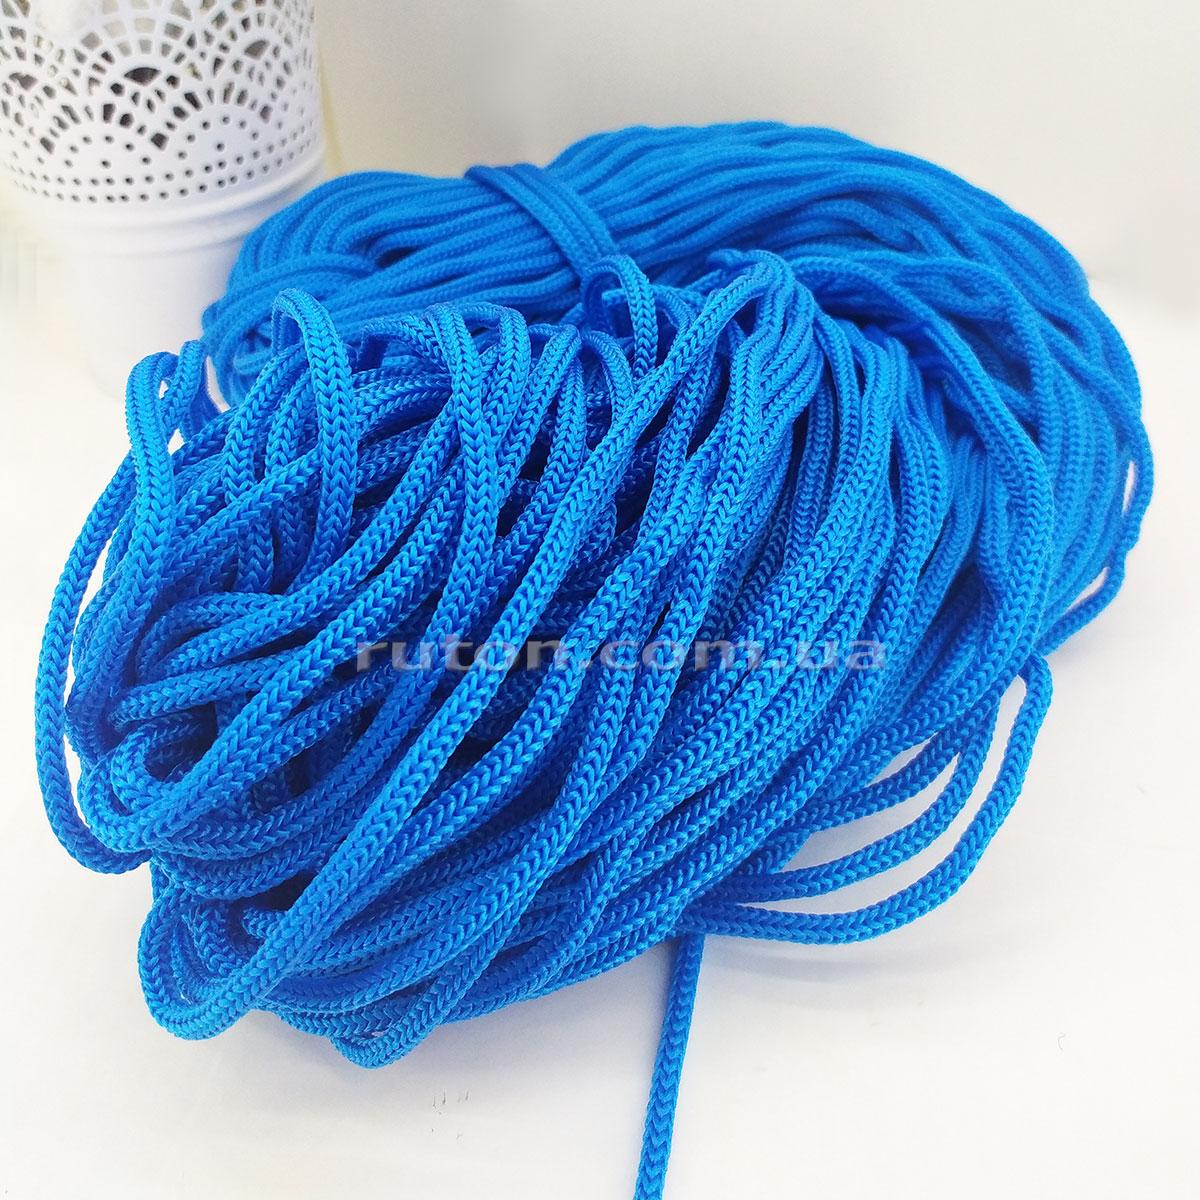 Шнур полиэфирный без сердечника 5 мм 85 м электрик